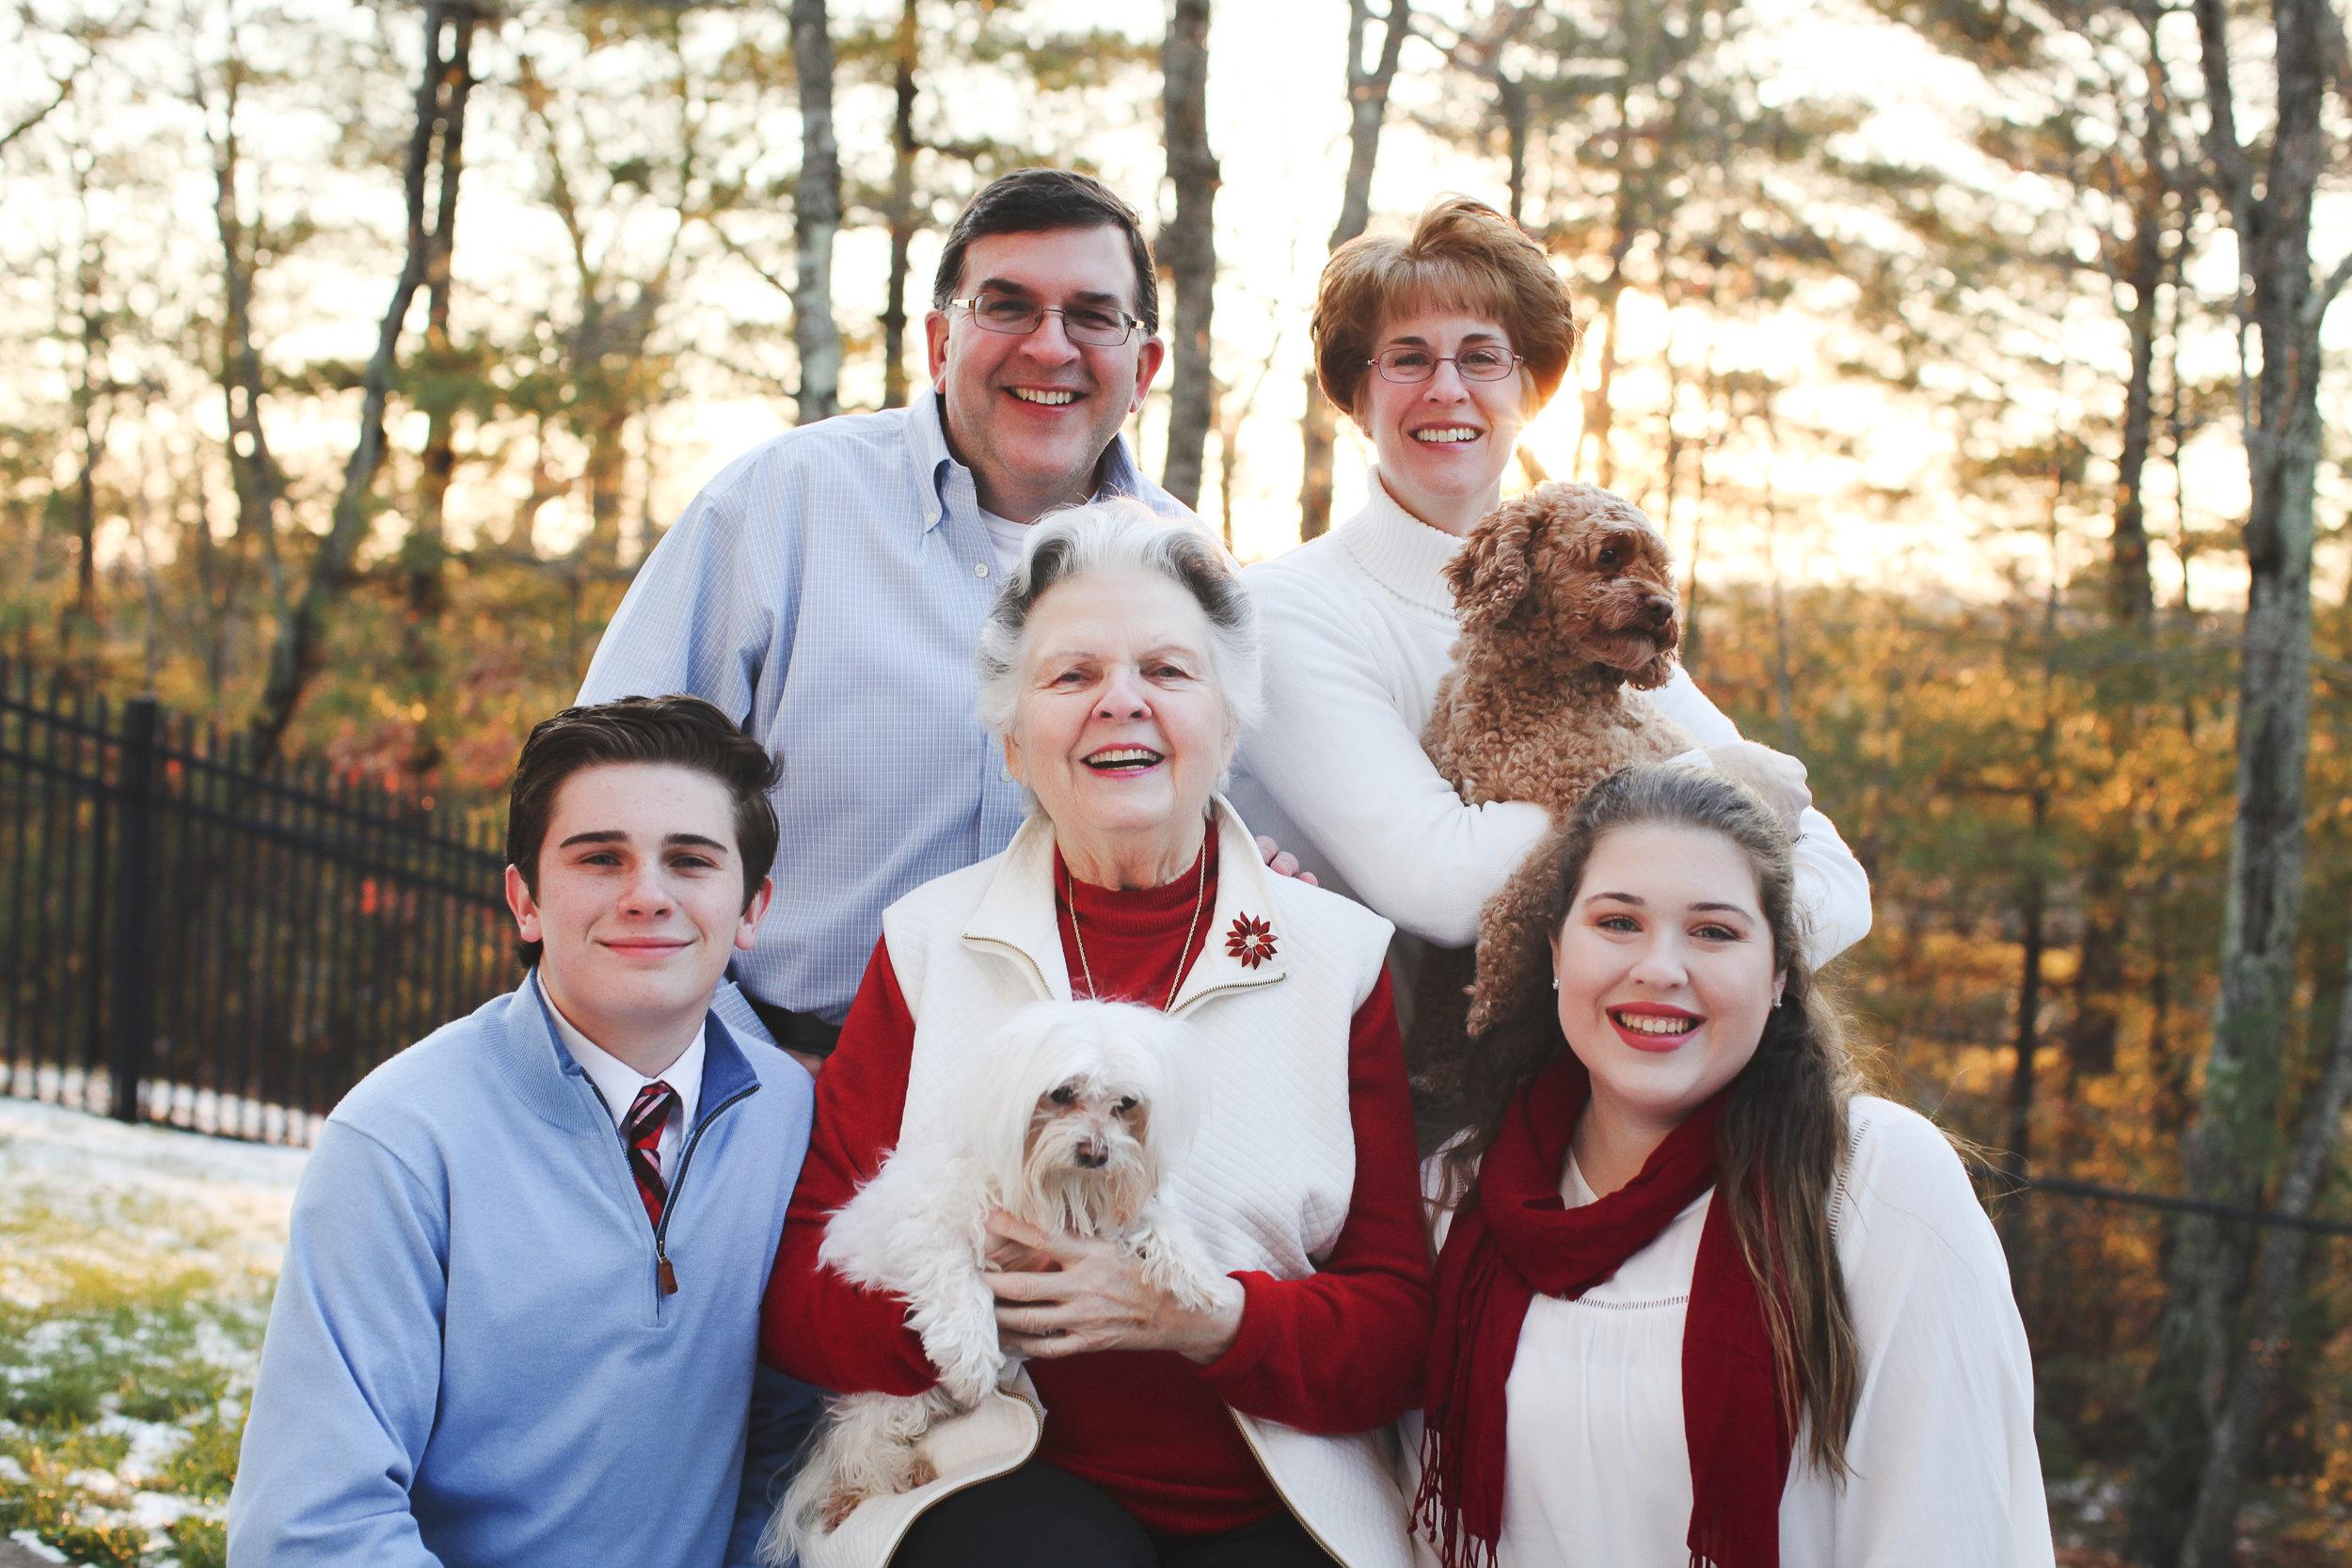 WINTER COLOR FAMILIES